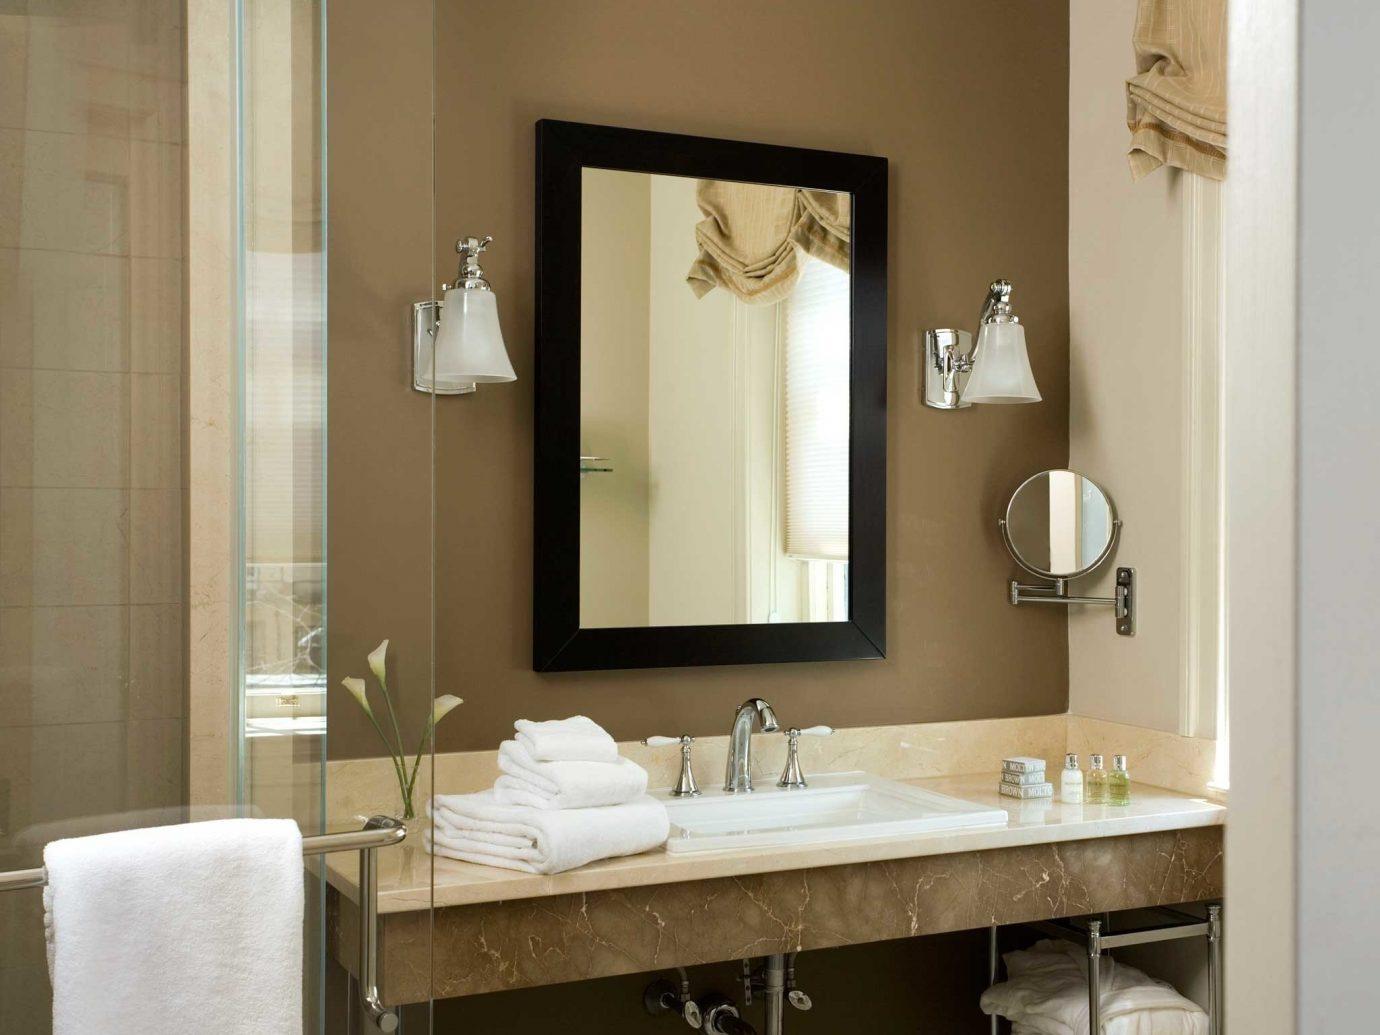 Bath Boutique Boutique Hotels Classic Elegant Historic Hotels Inn Philadelphia bathroom wall indoor mirror sink room towel interior design floor home plumbing fixture bathroom cabinet Design Modern